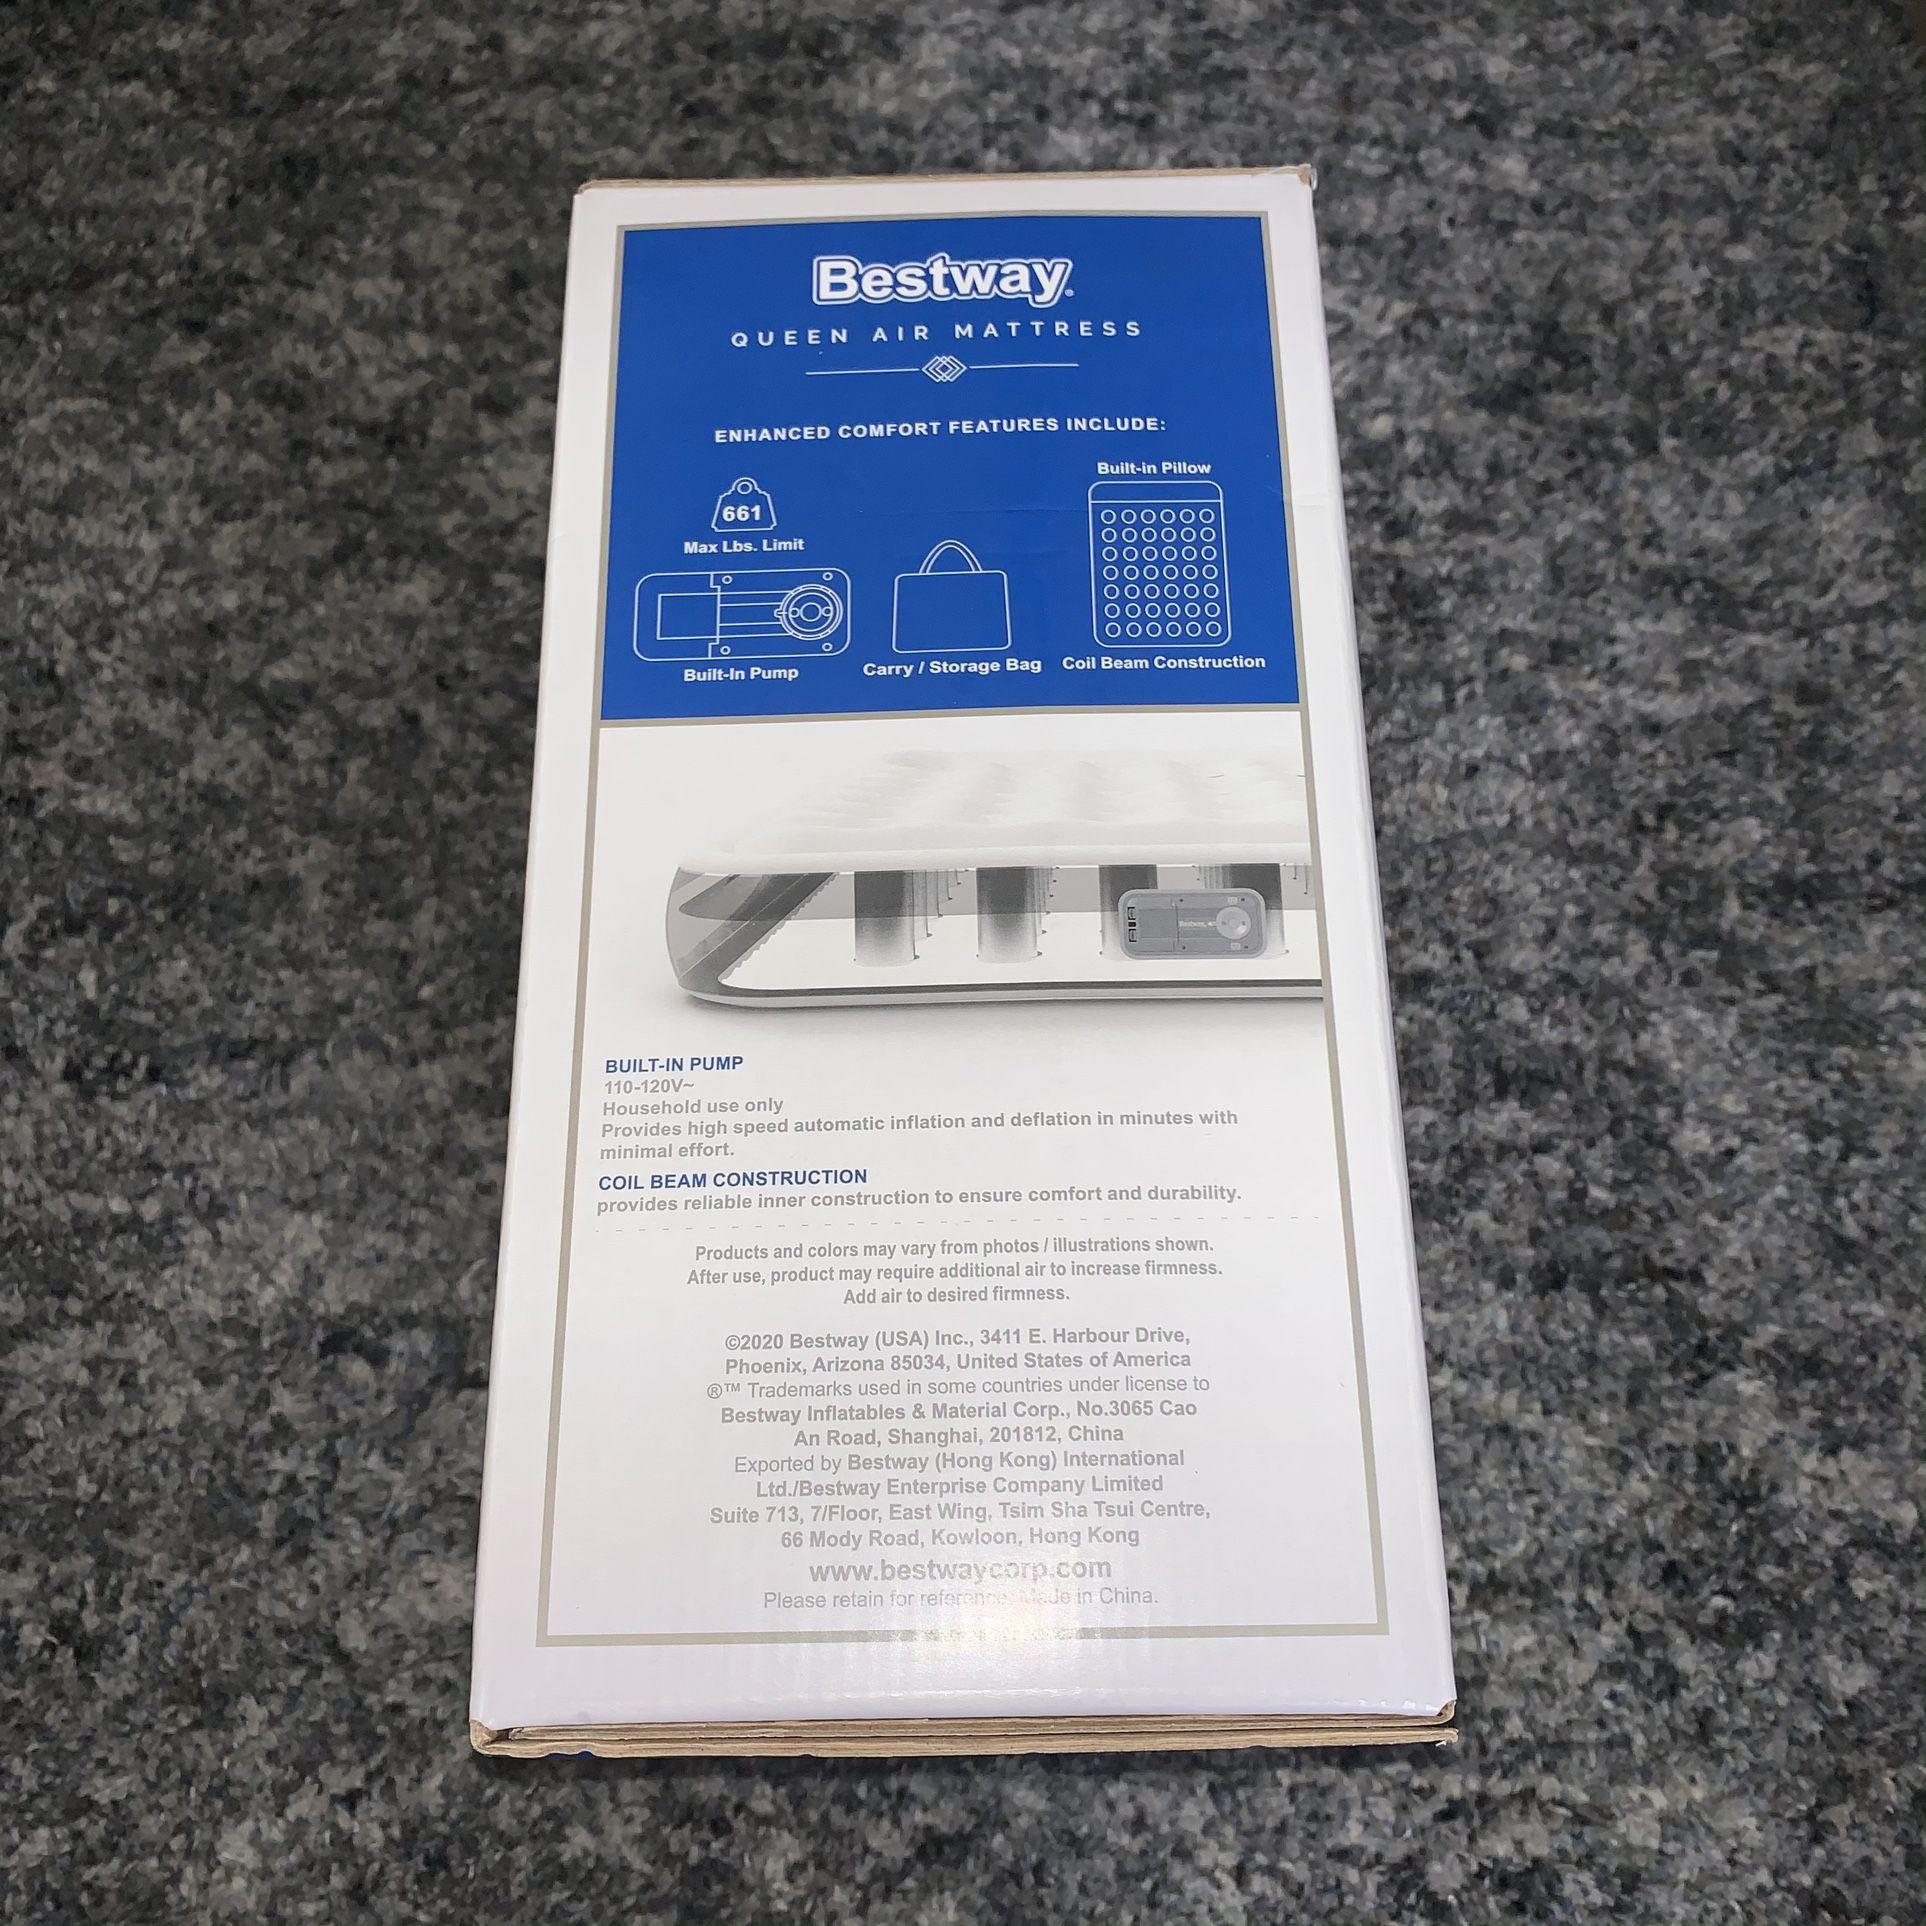 QUEEN air mattress w/ built-in a/c pump.